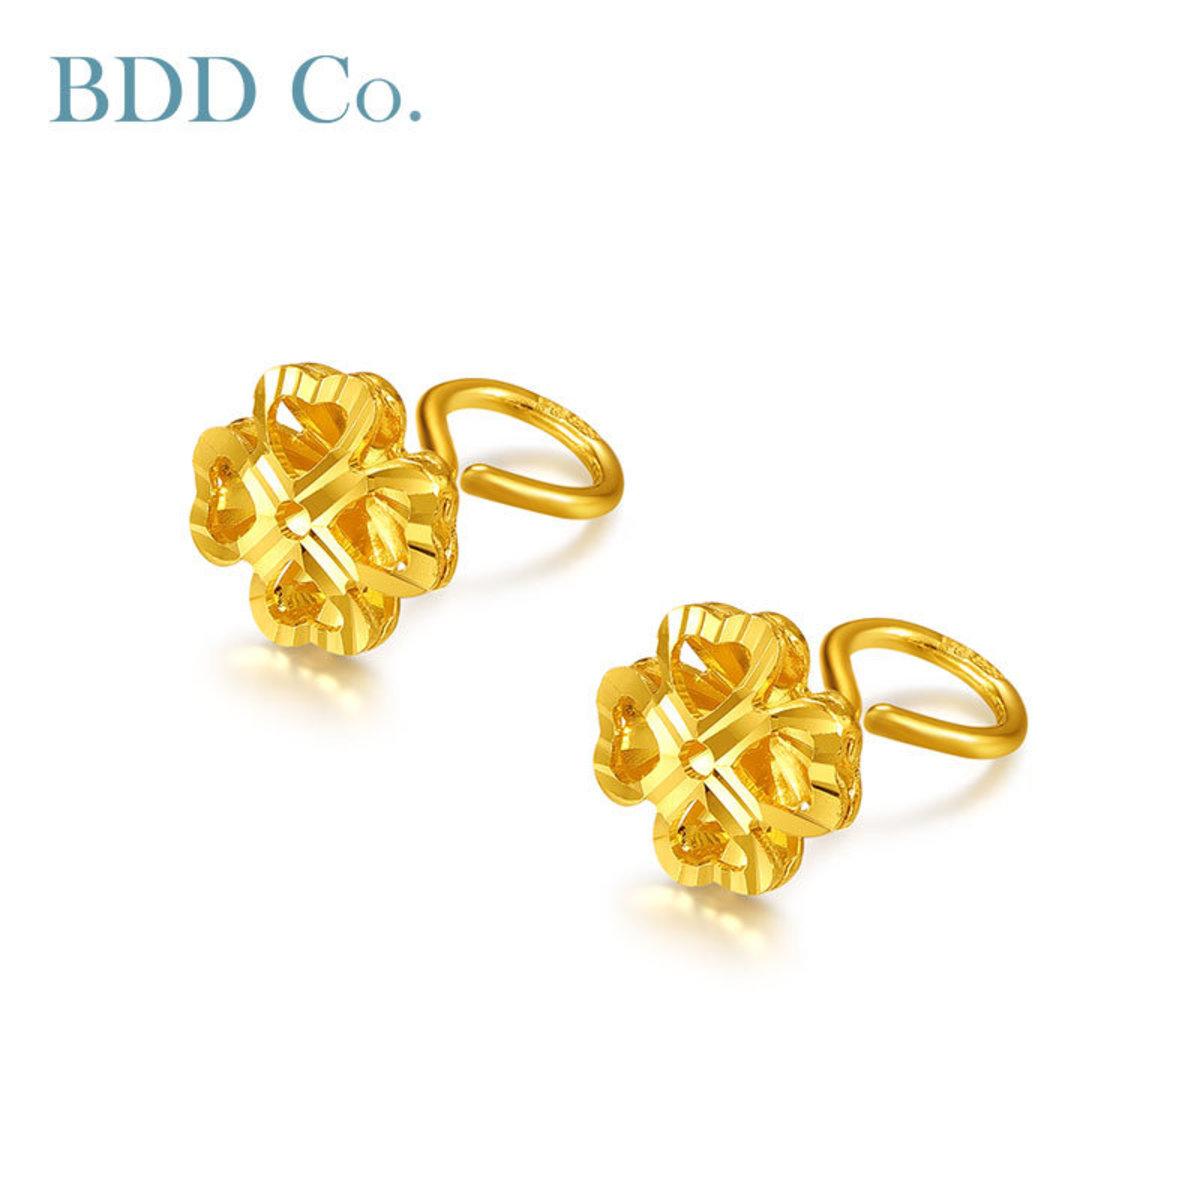 【BDD-Co.】黃金耳環 足金四葉草耳釘